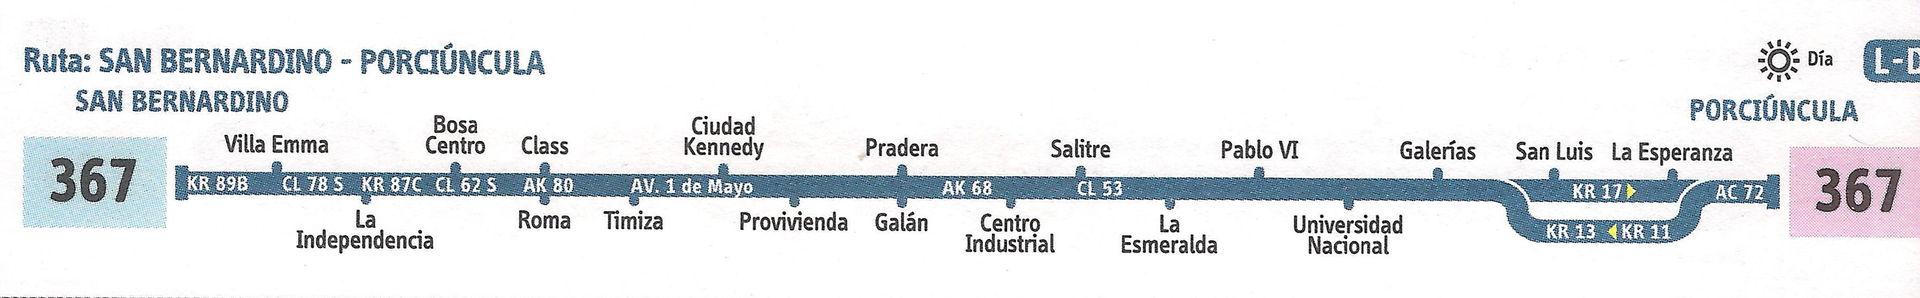 Ruta SITP: 367 San Bernardino ↔ Porciúncula [Urbana] 3